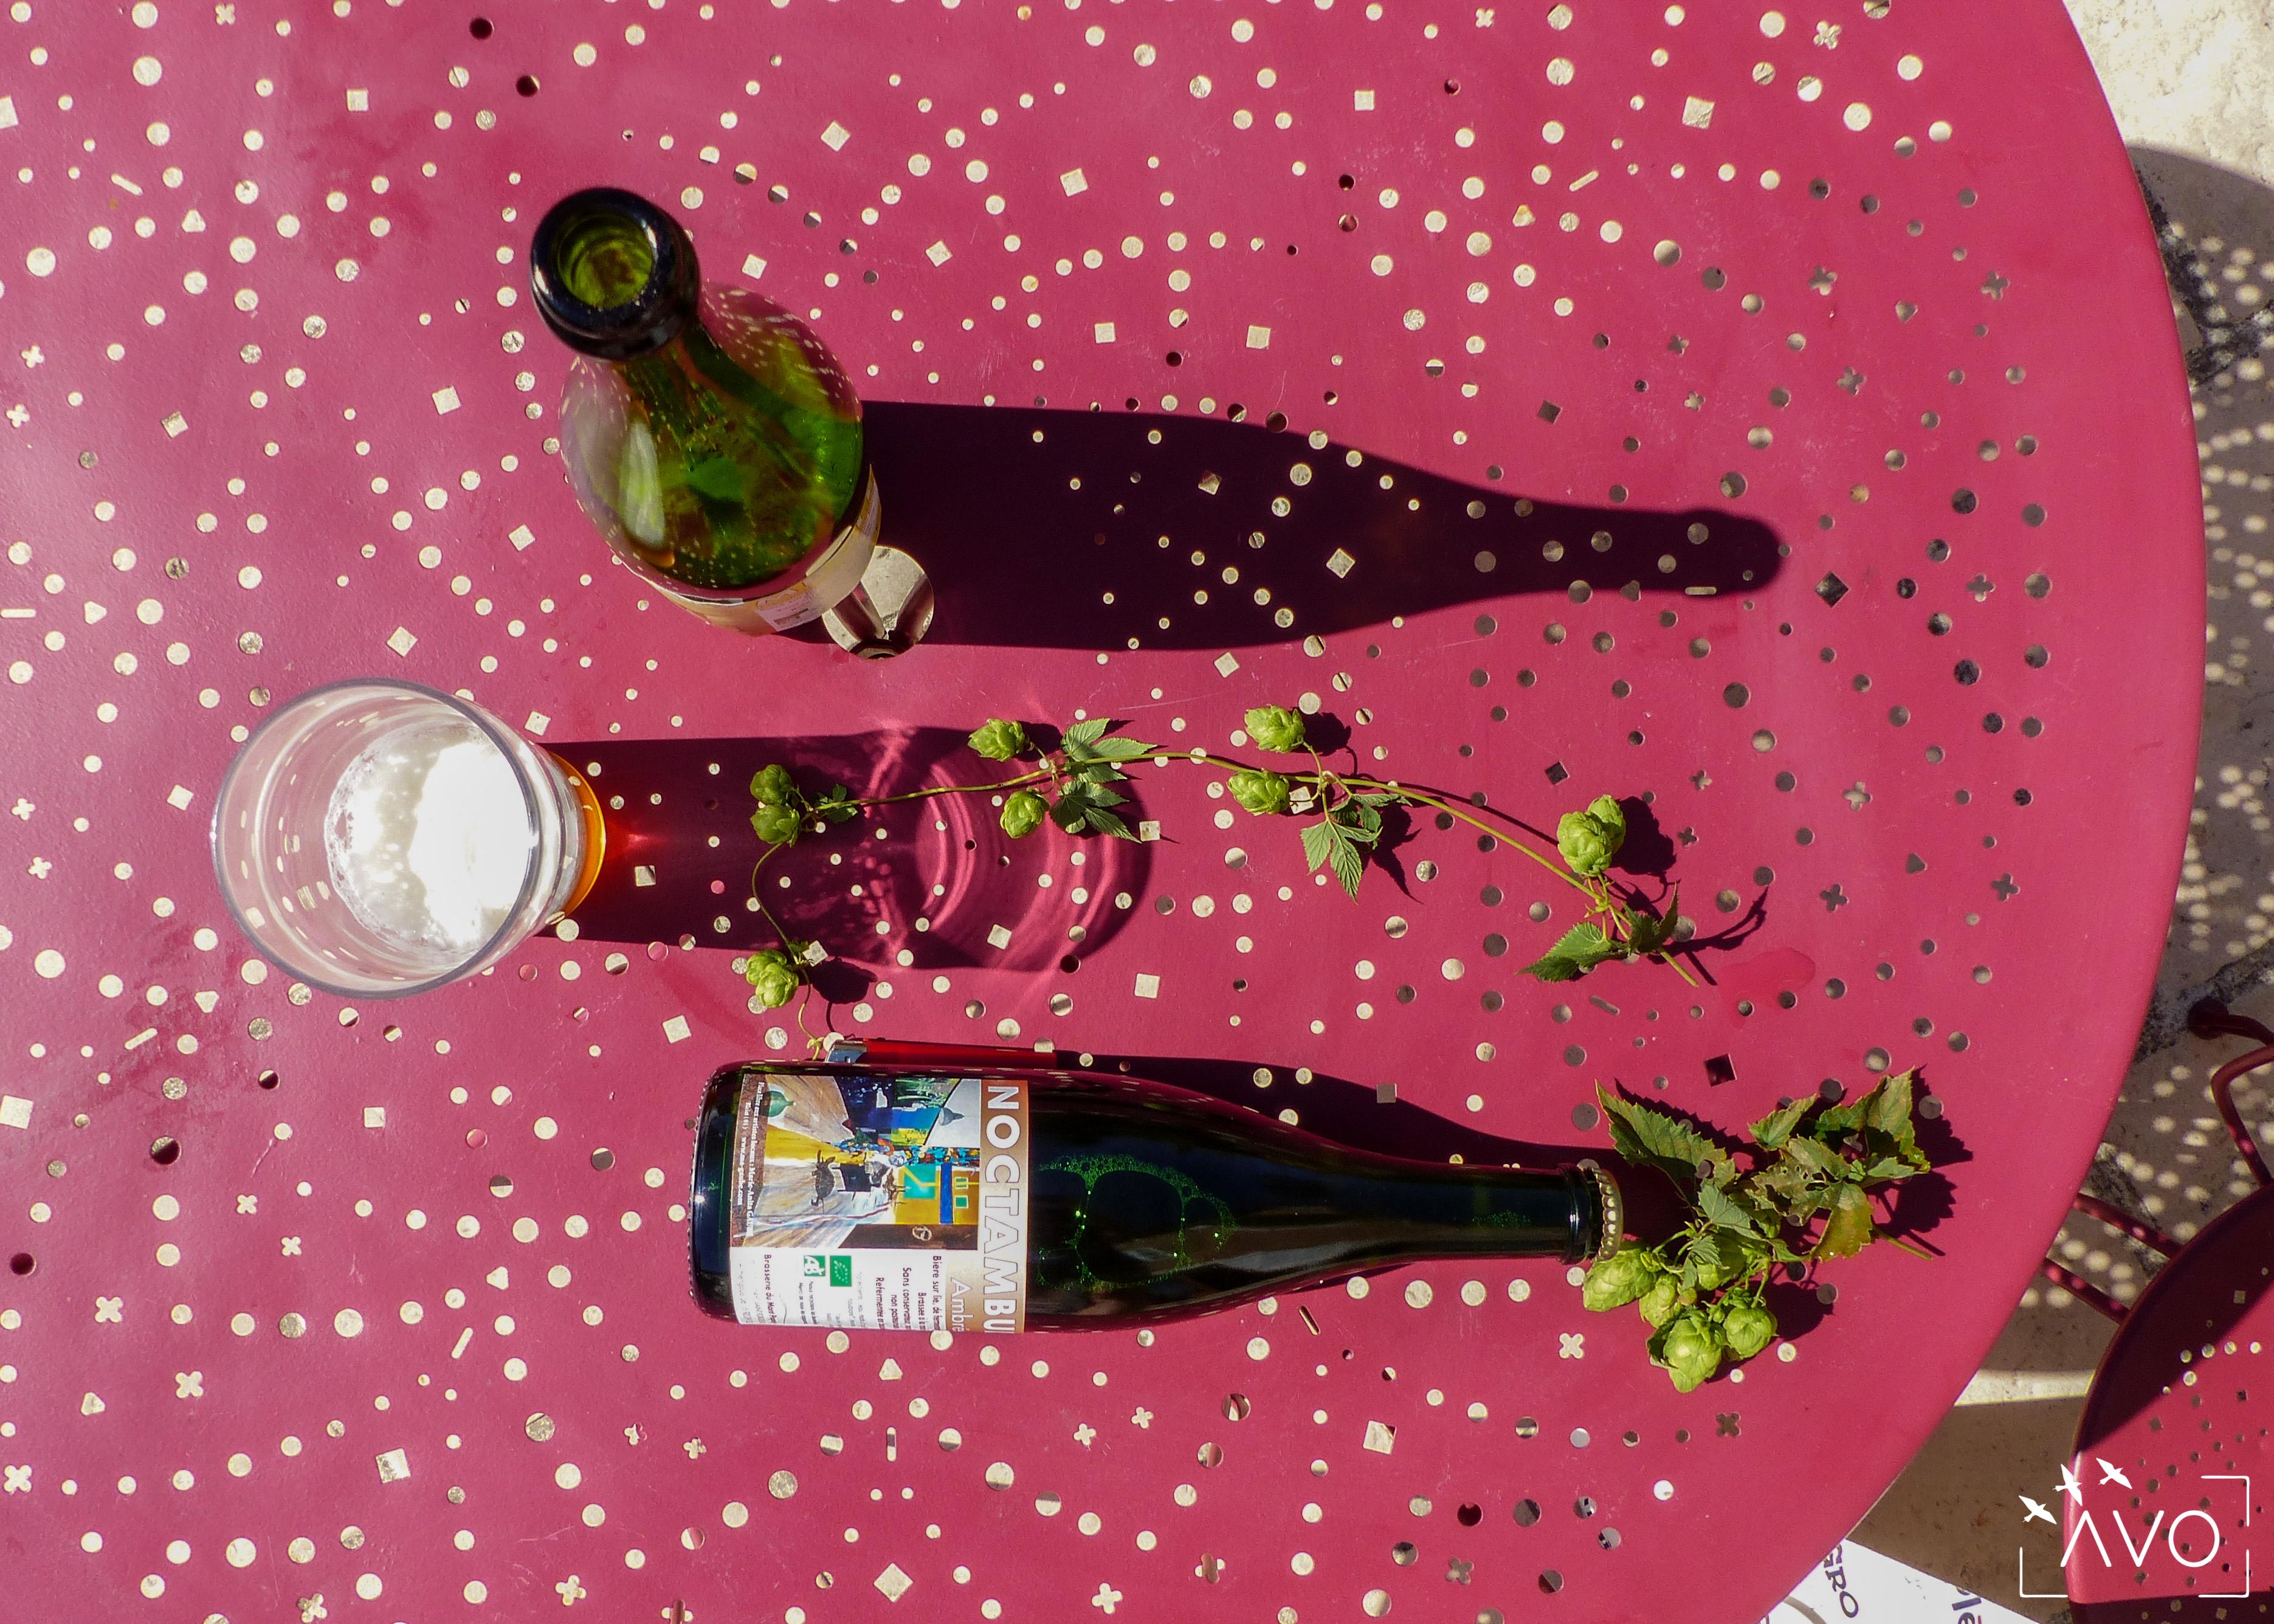 avo-ecologie-biere-bio-lyon-bieres-noctambule-table-boire